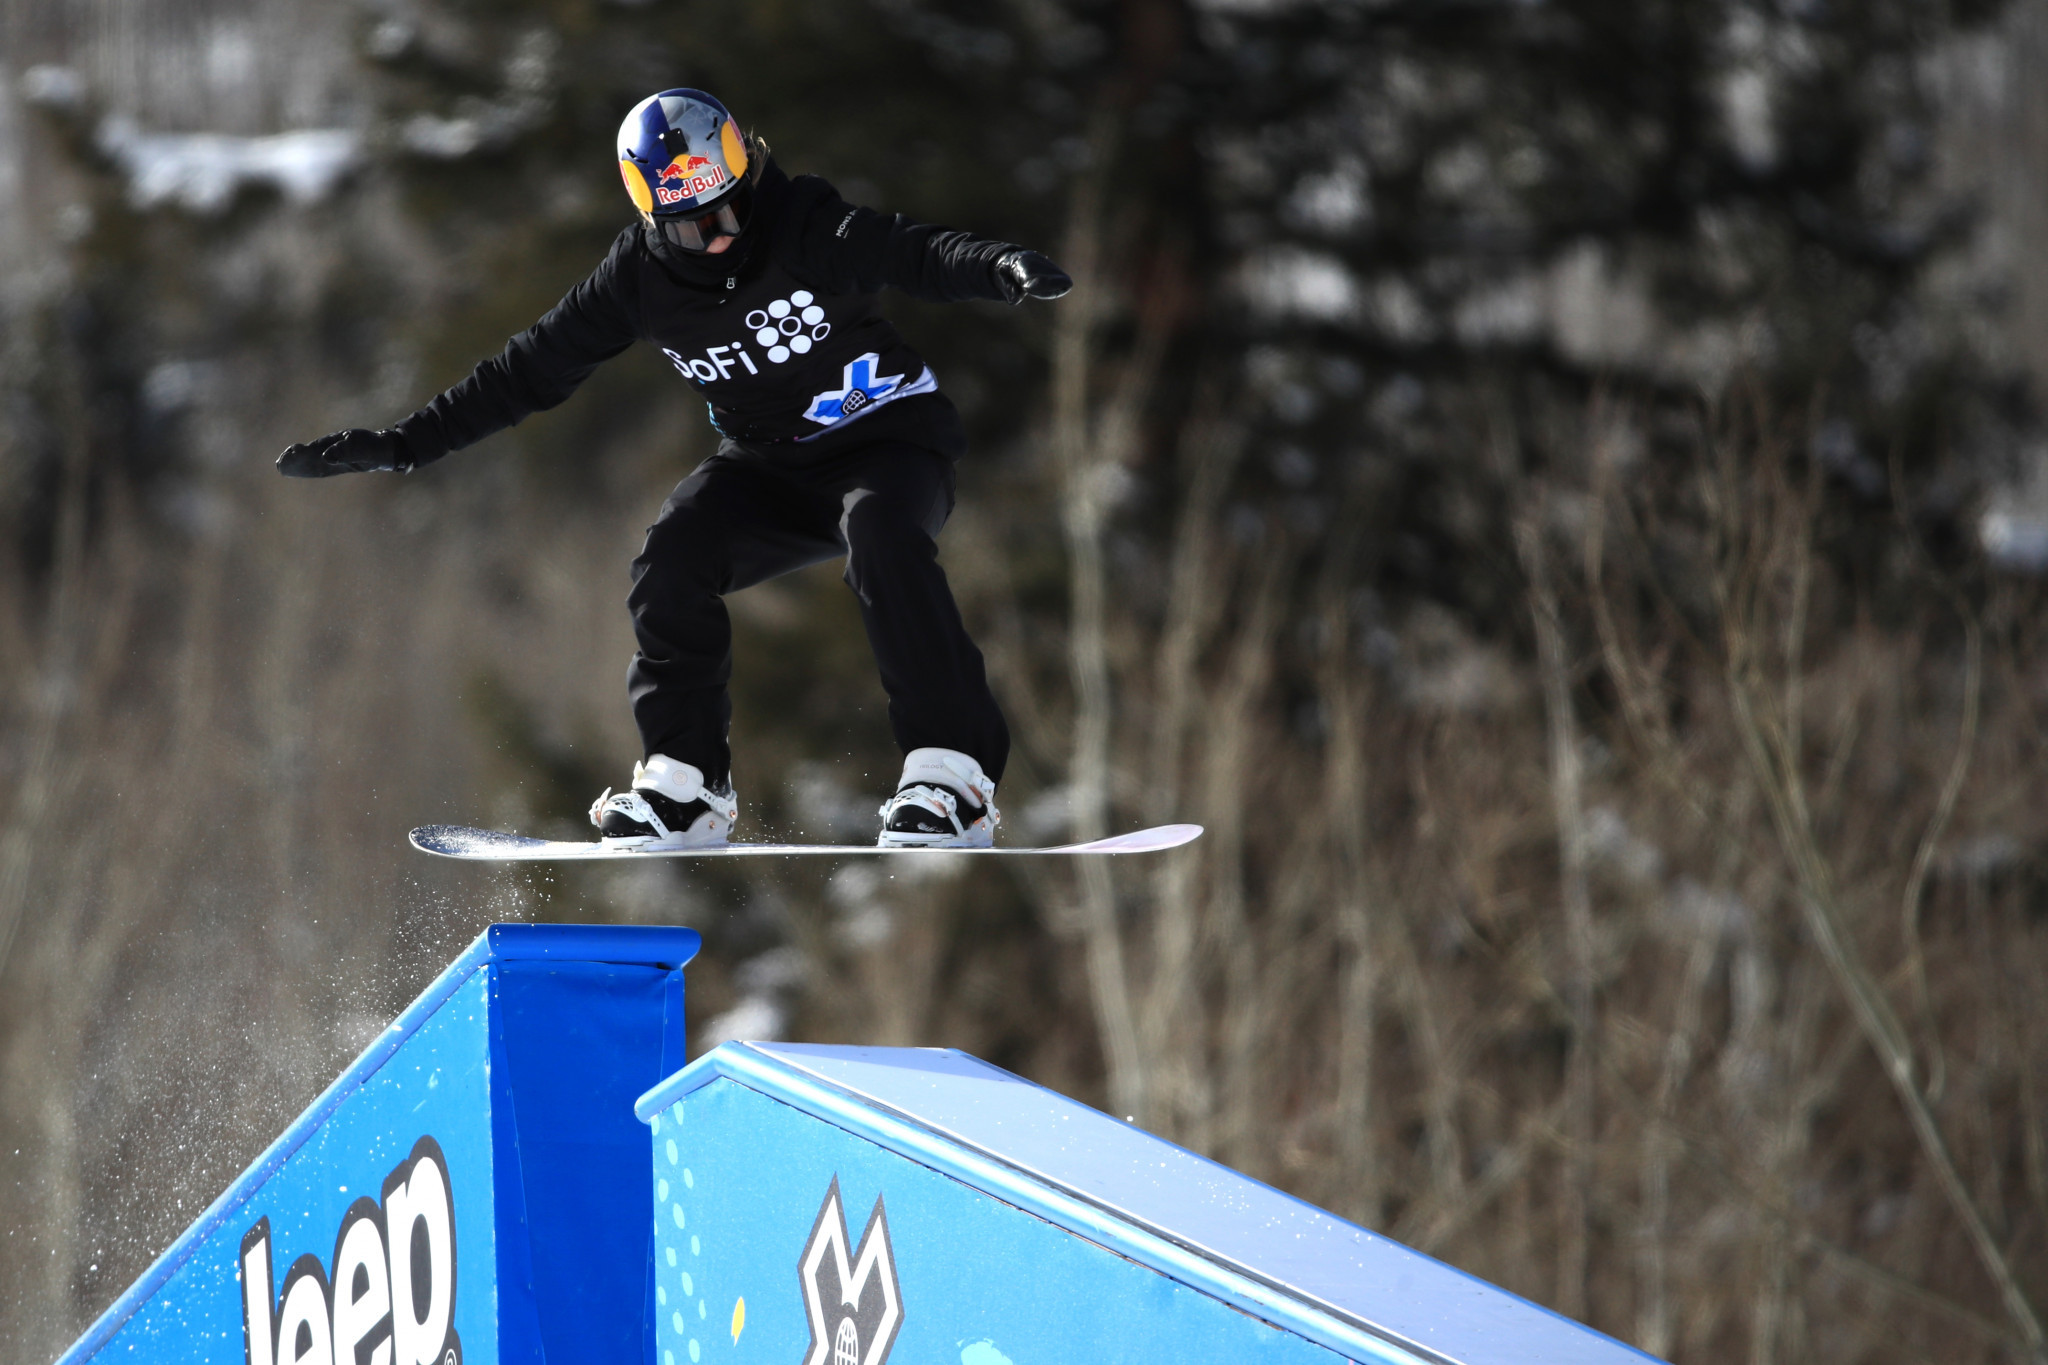 Olympic medallists confirmed as Winter Games NZ 2019 ambassadors